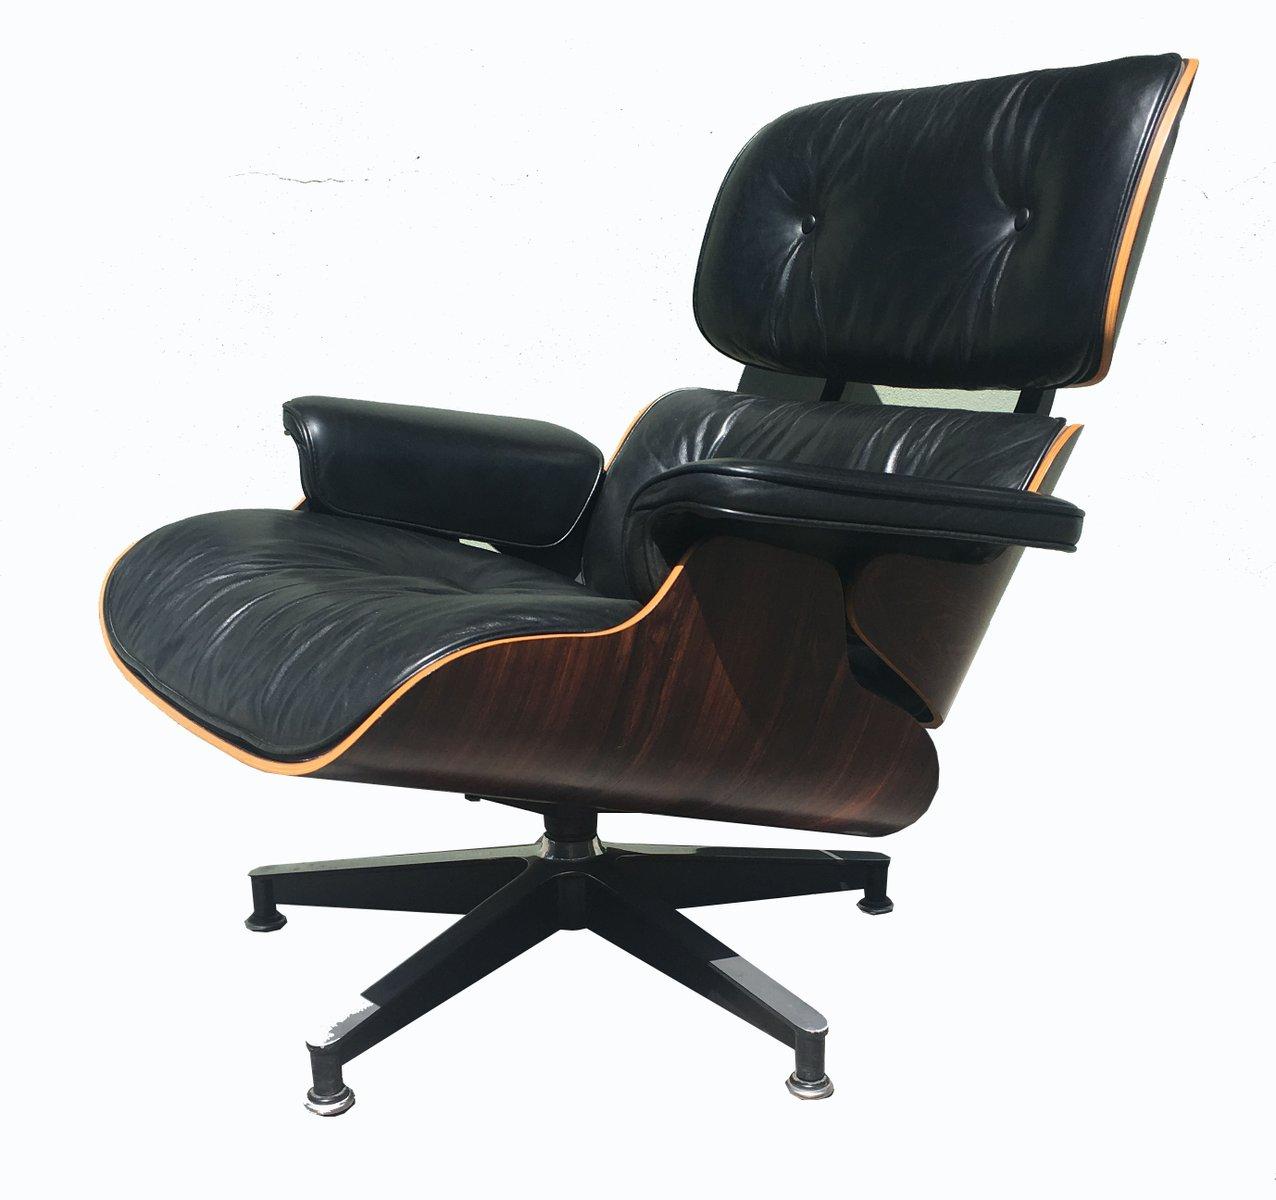 670 671 sessel ottomane von charles ray eames f r herman miller 1980er bei pamono kaufen. Black Bedroom Furniture Sets. Home Design Ideas